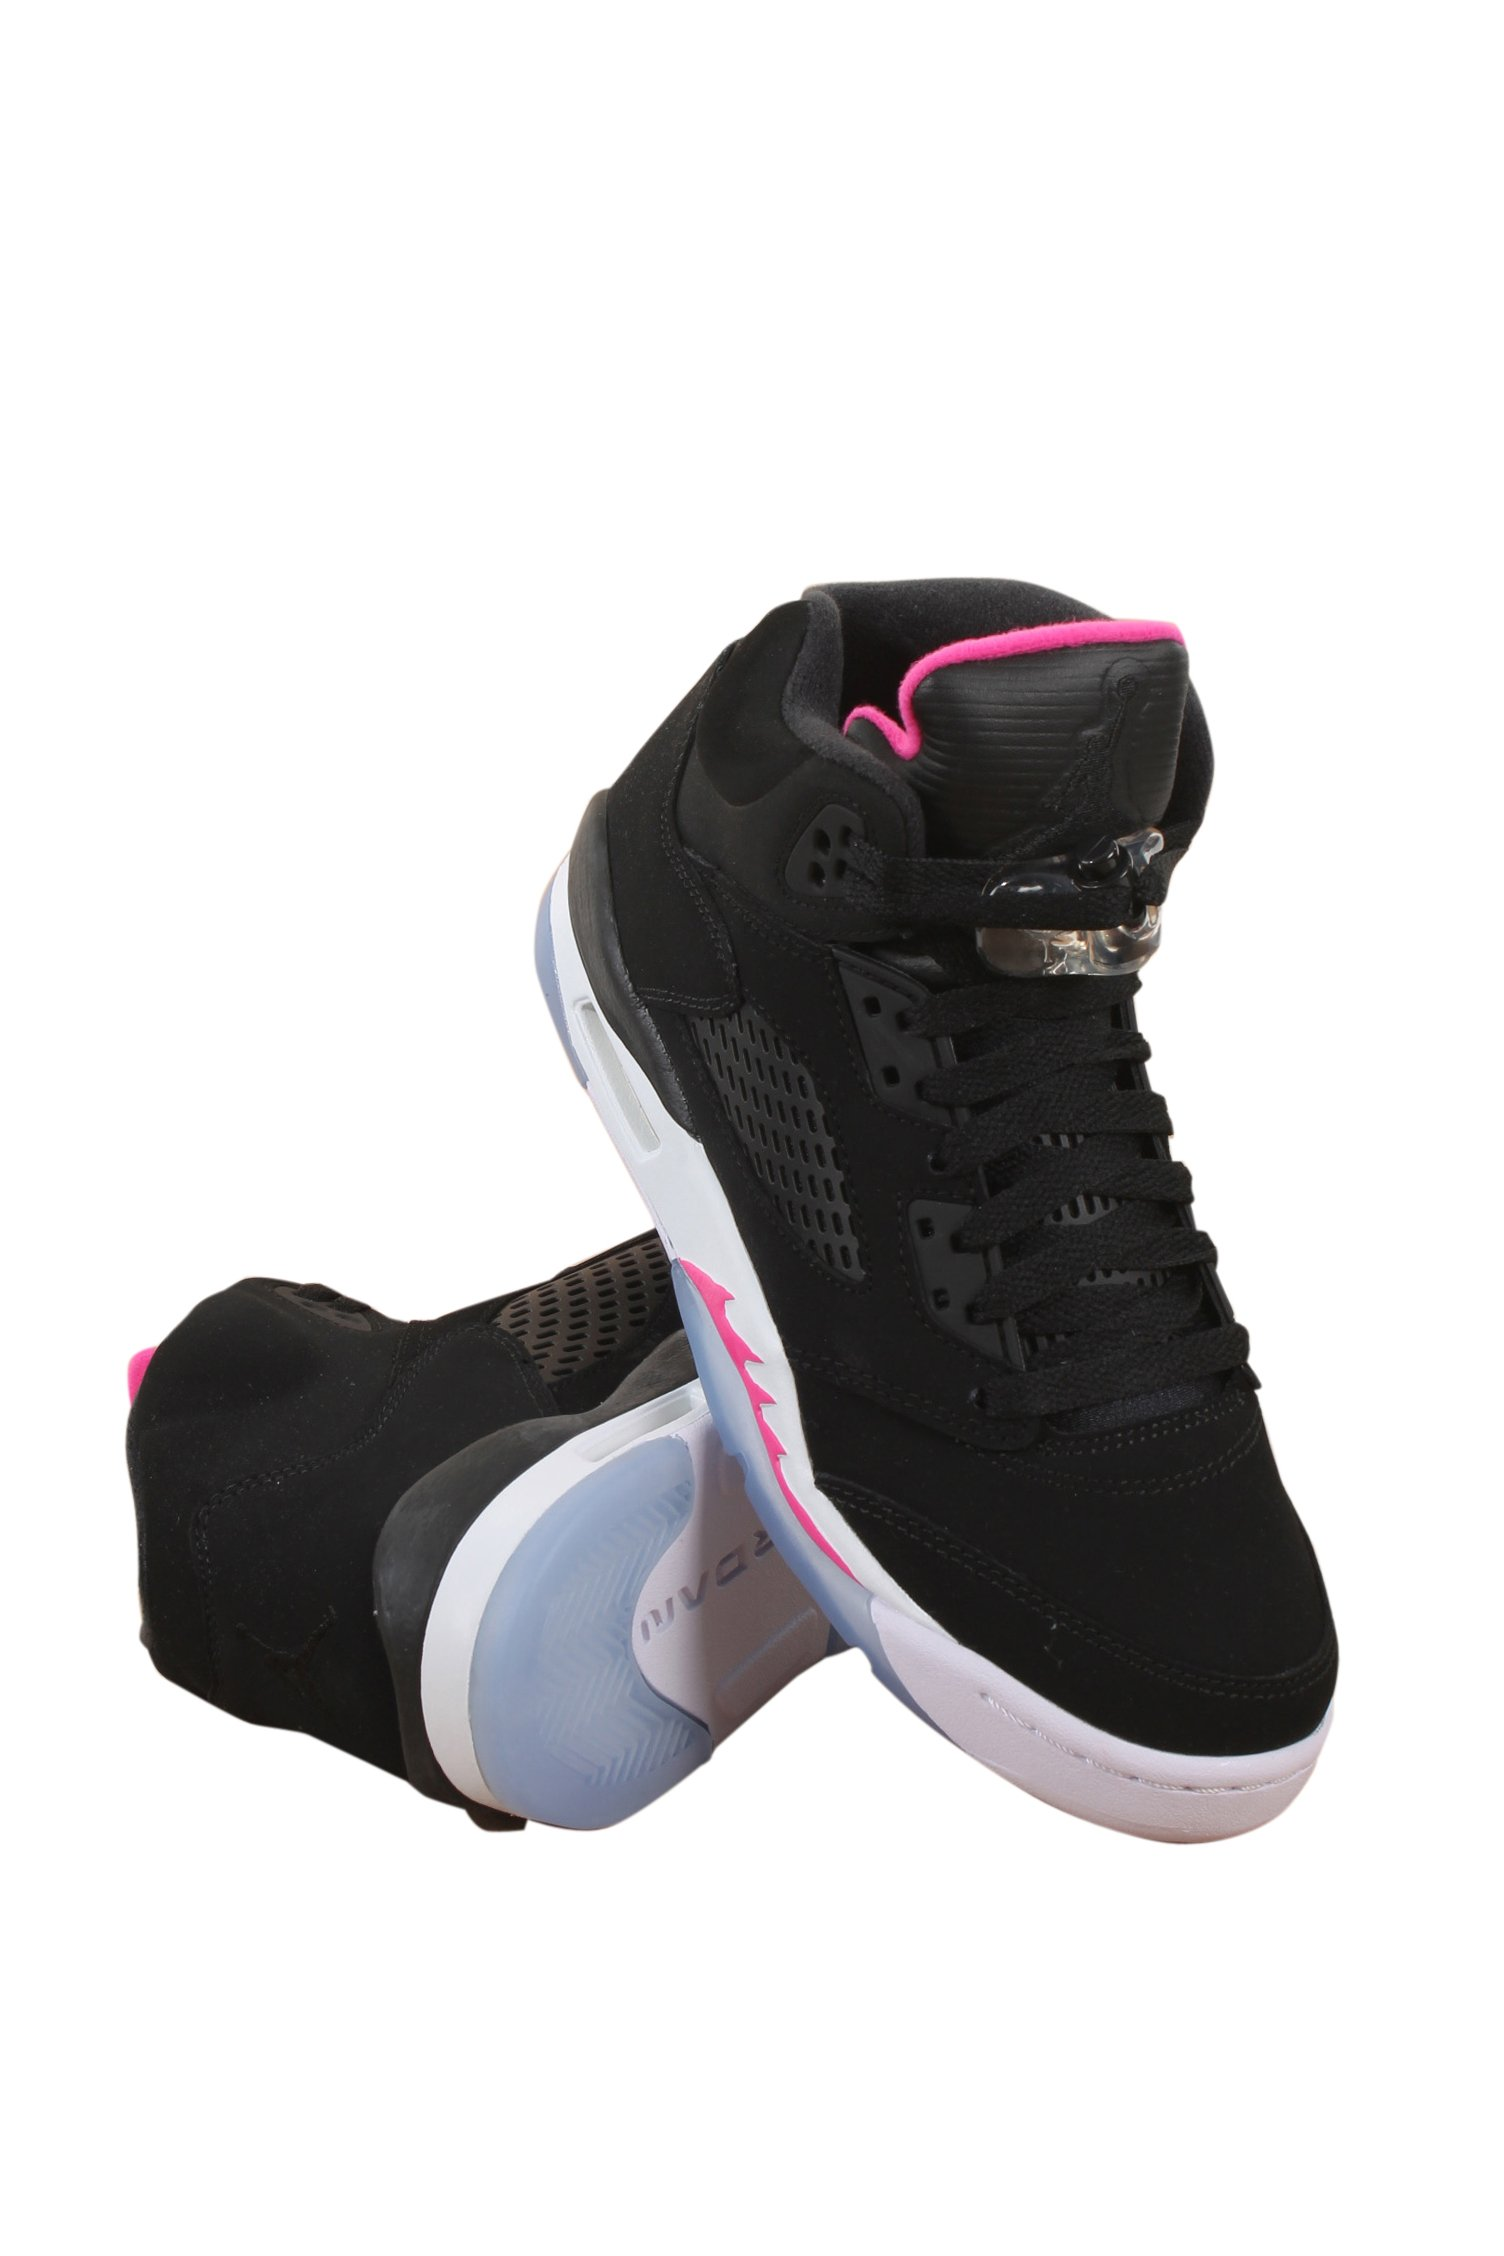 Jordan AIR 5 RETRO GG GIRL GRADE SCHL girls basketball-shoes 440892-029_7.5Y - BLACK/BLACK-DEADLY PINK-WHITE